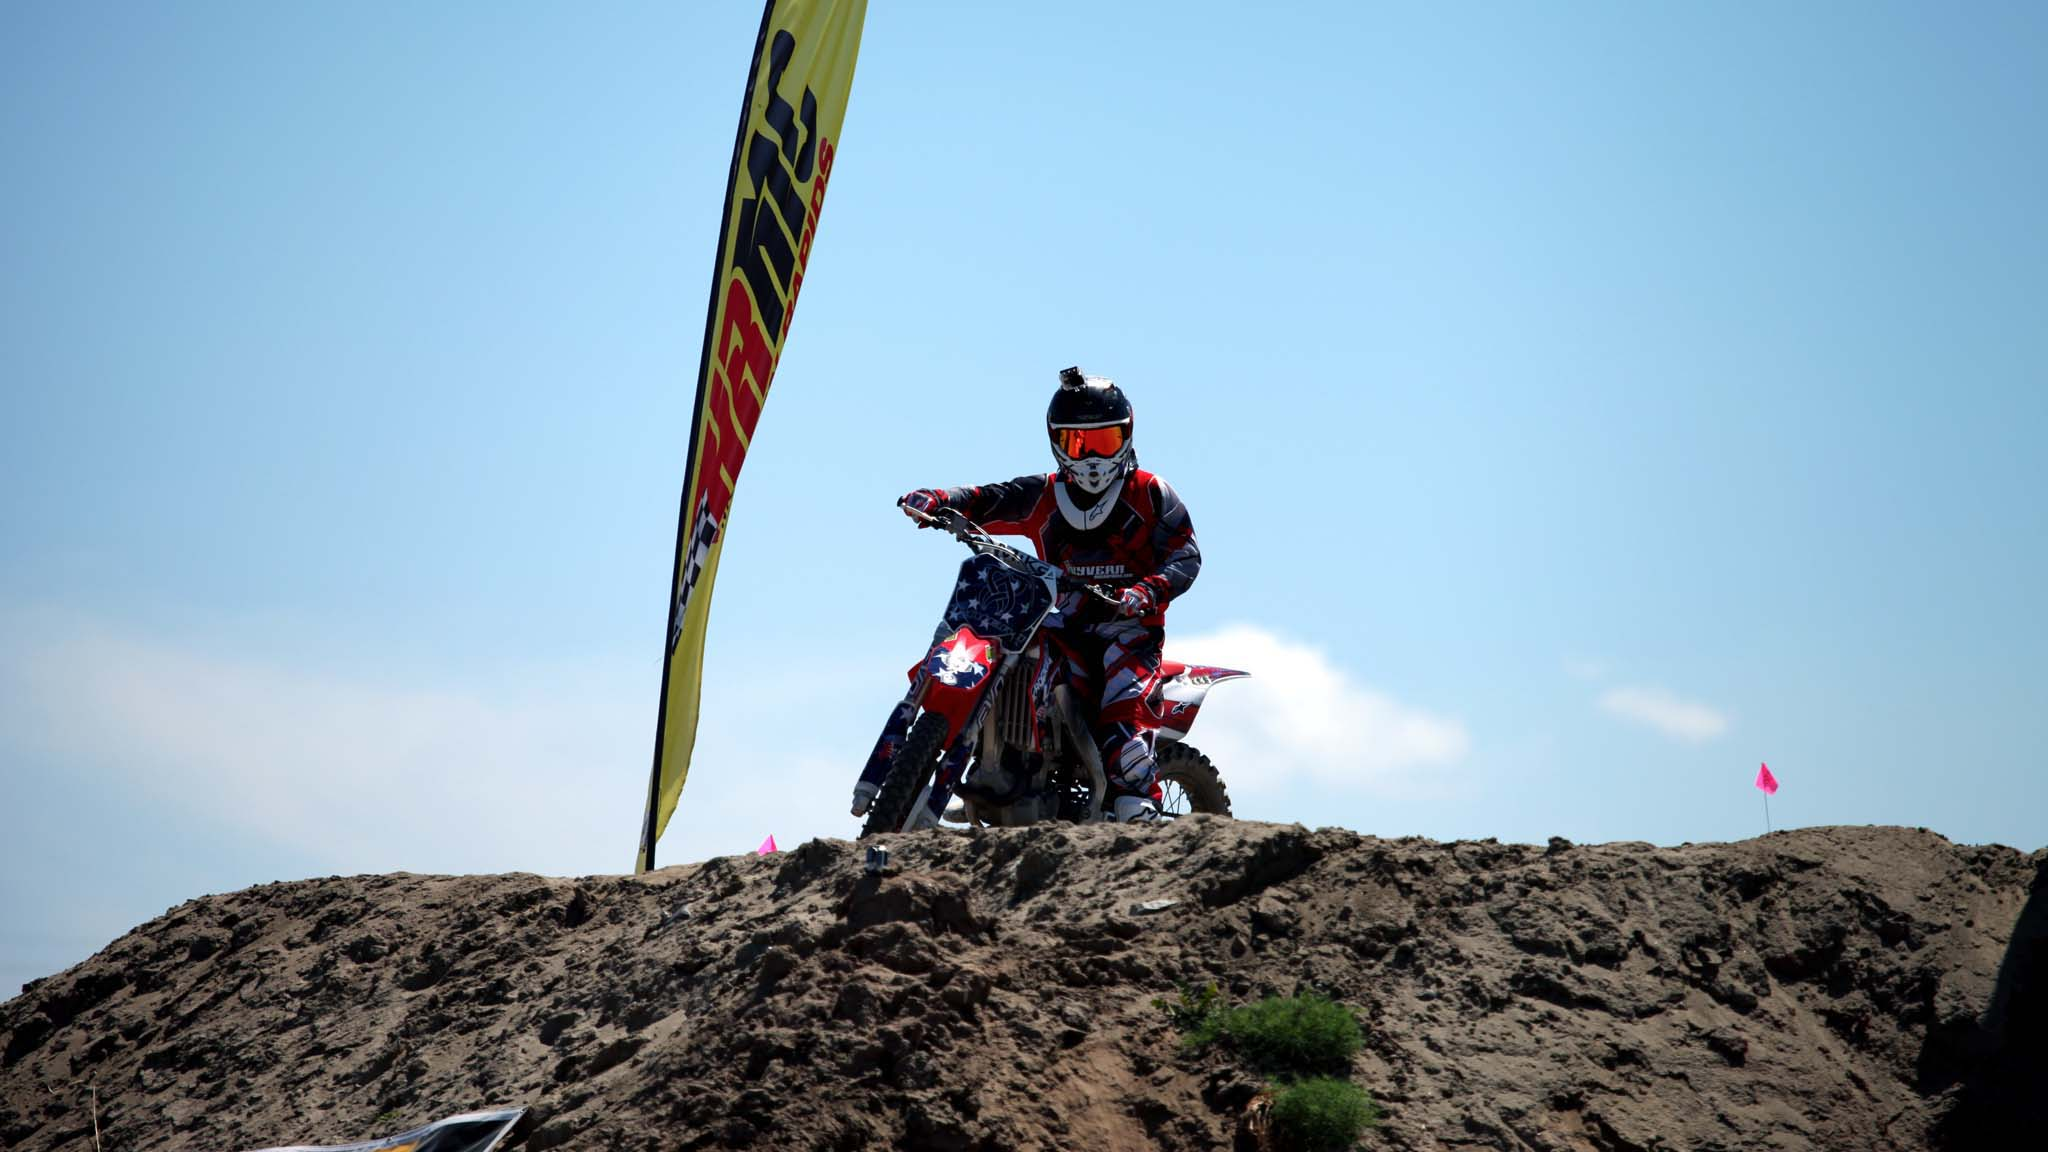 Alex Harvill